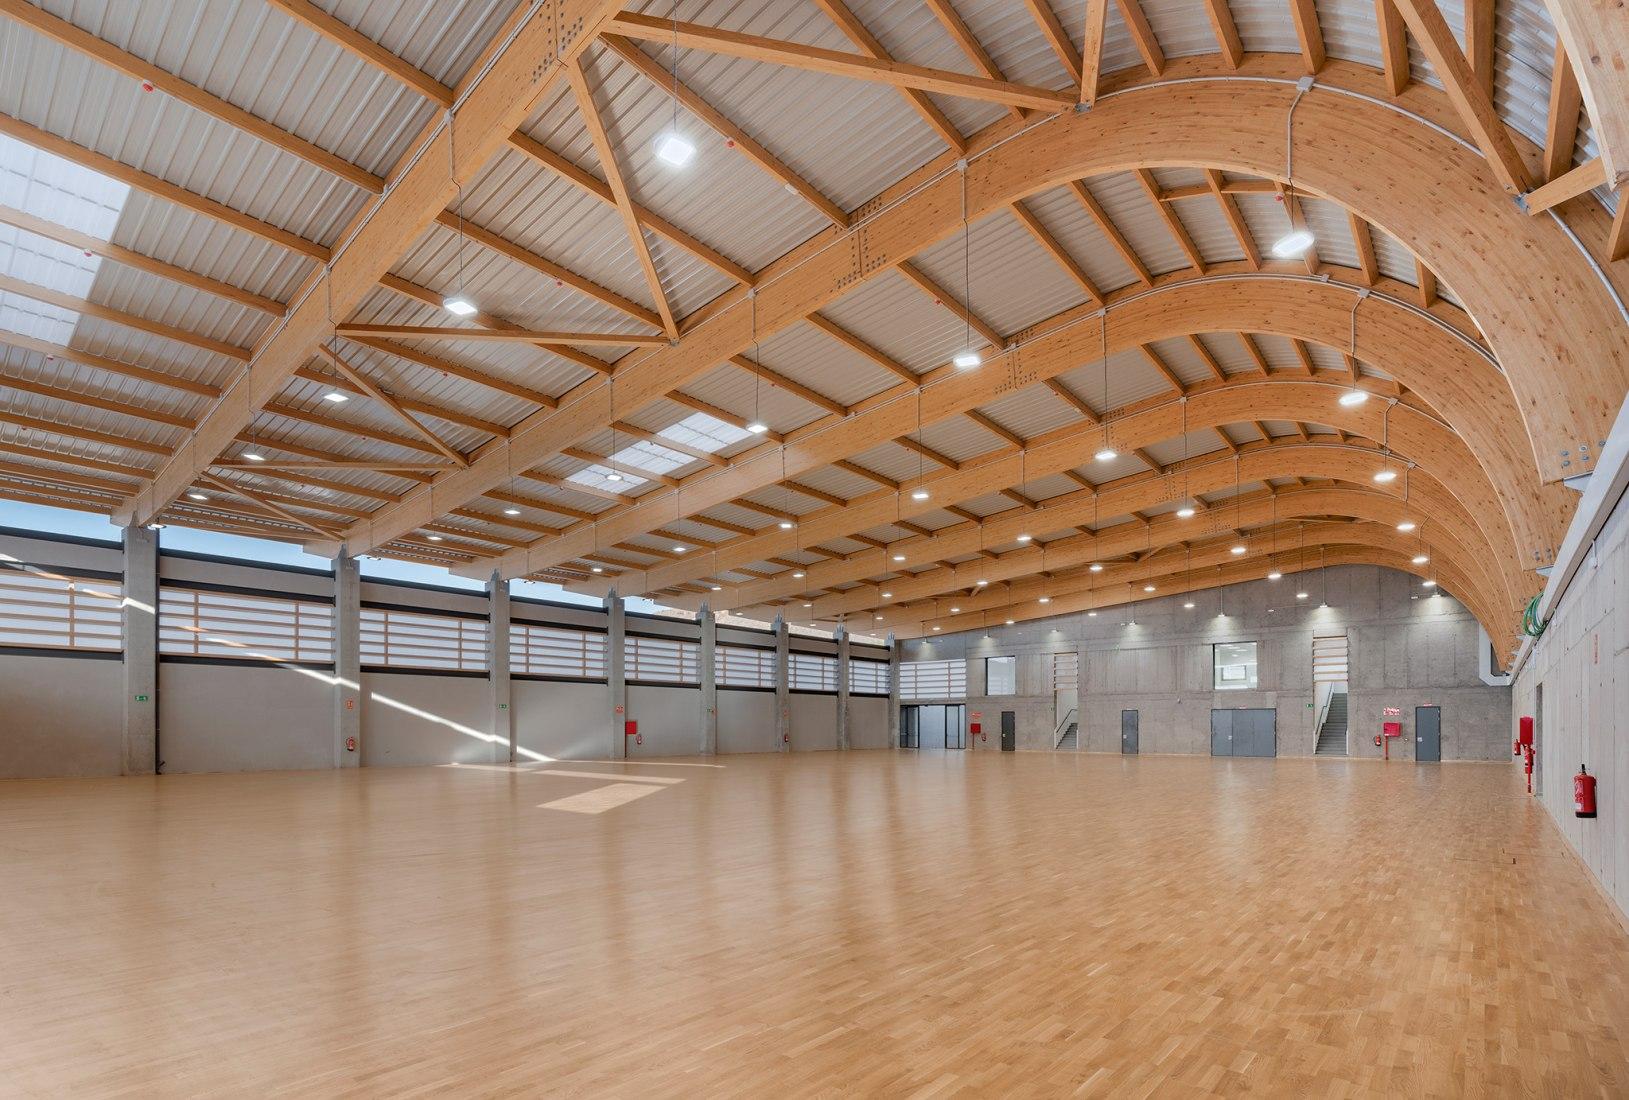 Valle San Lorenzo Municipal Sports Hall by Makin Molowny Portela. Photograph by Maxim Deknock